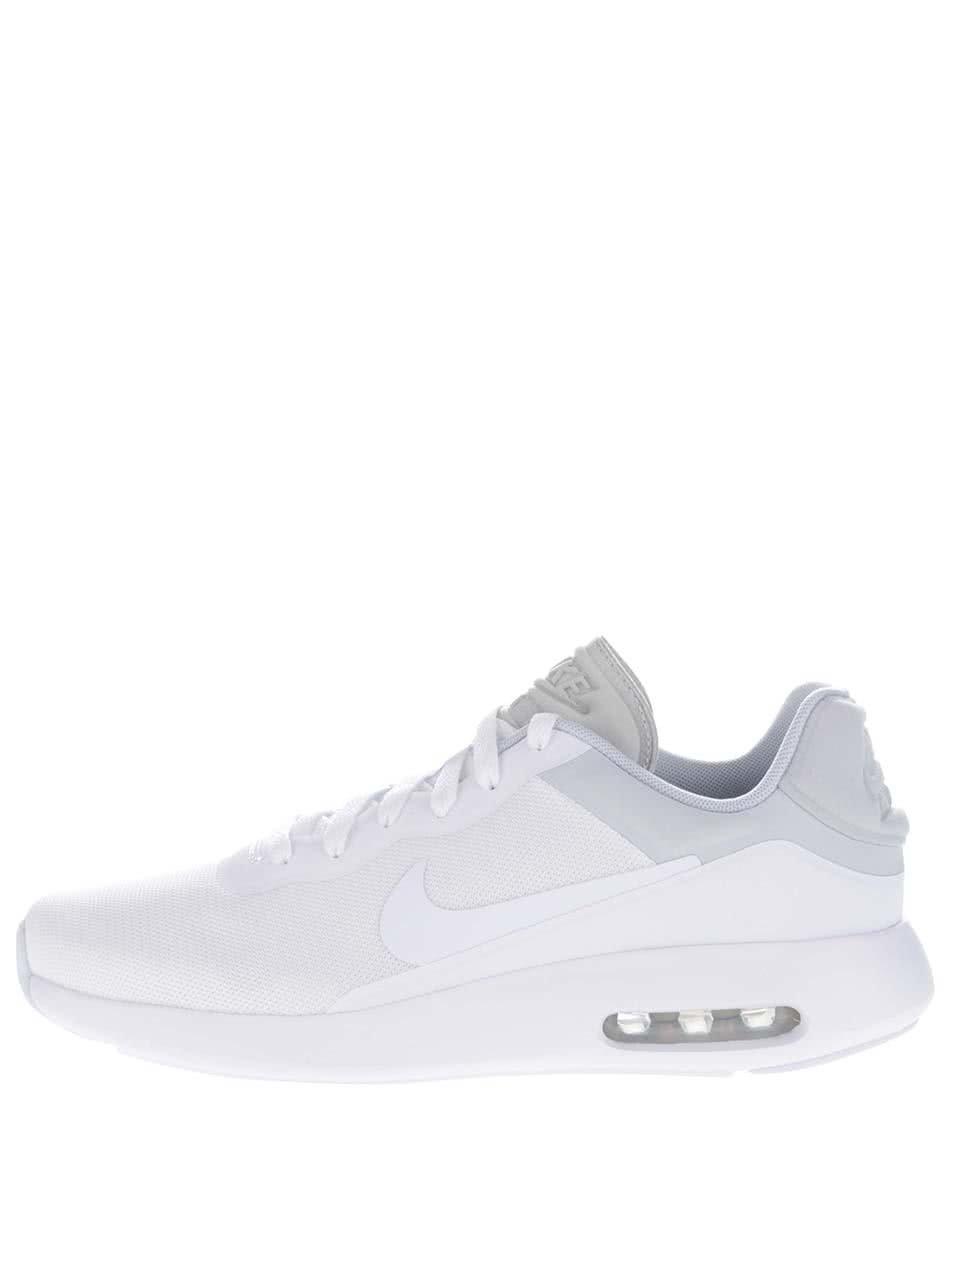 Biele pánske tenisky Nike Air Max ... dbafe9d77d1